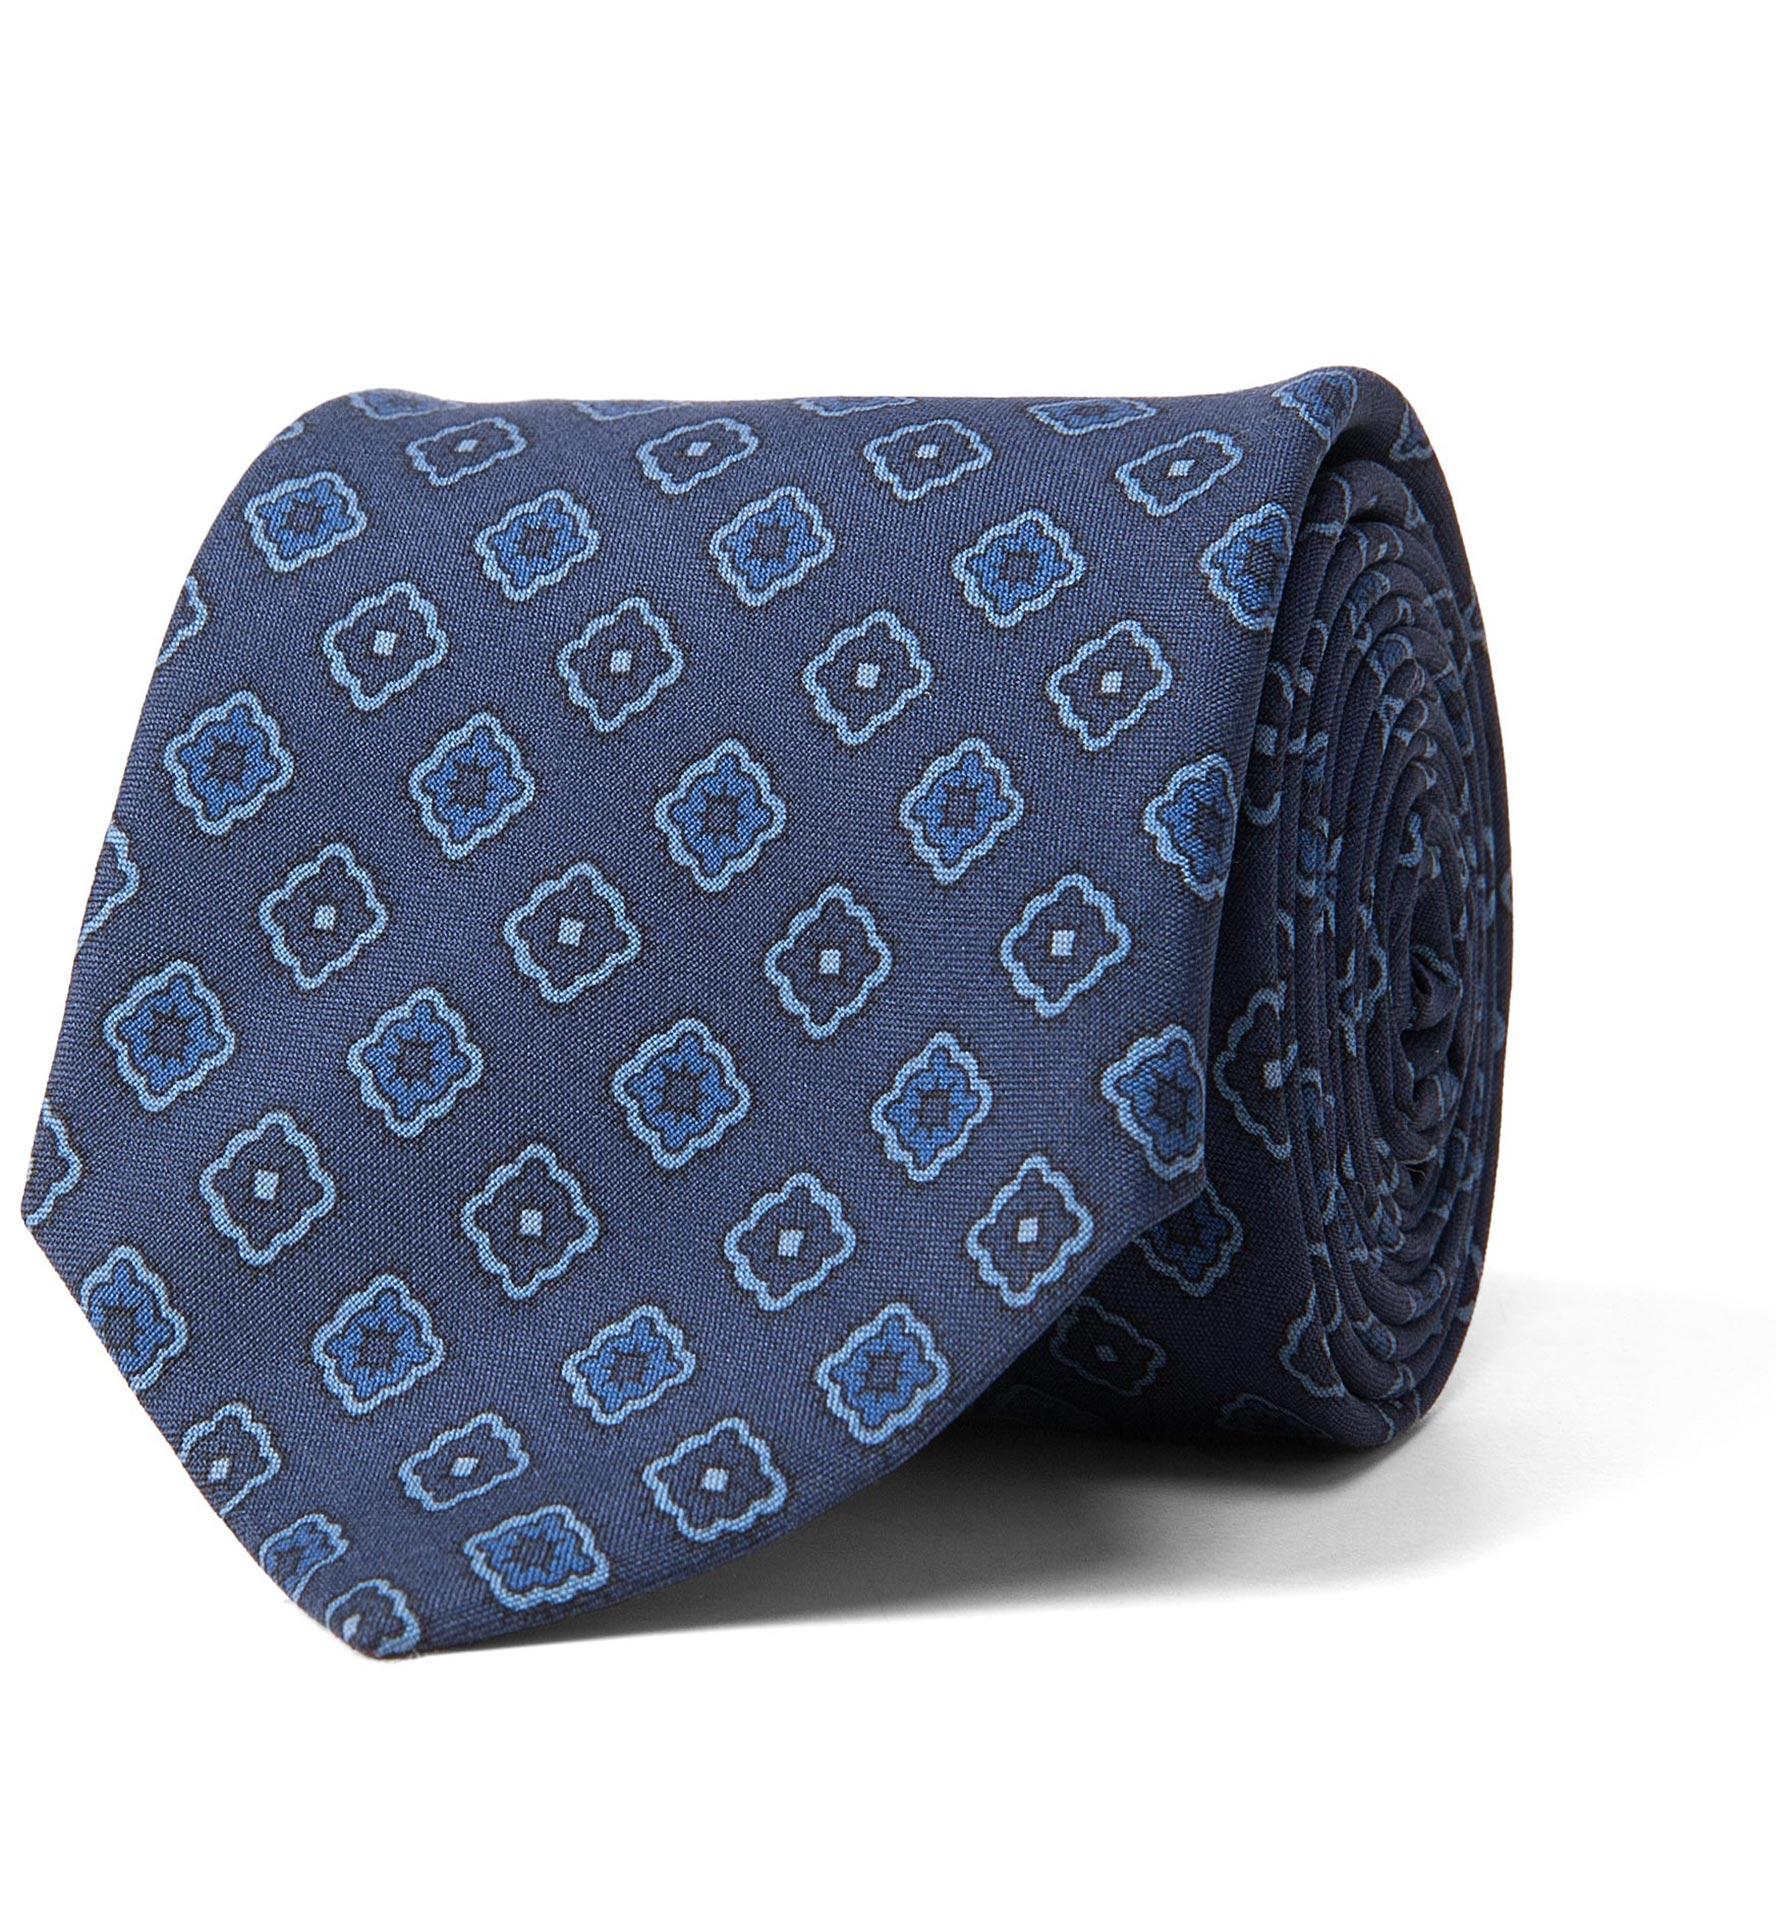 Zoom Image of Slate Blue Foulard Print Silk Tie